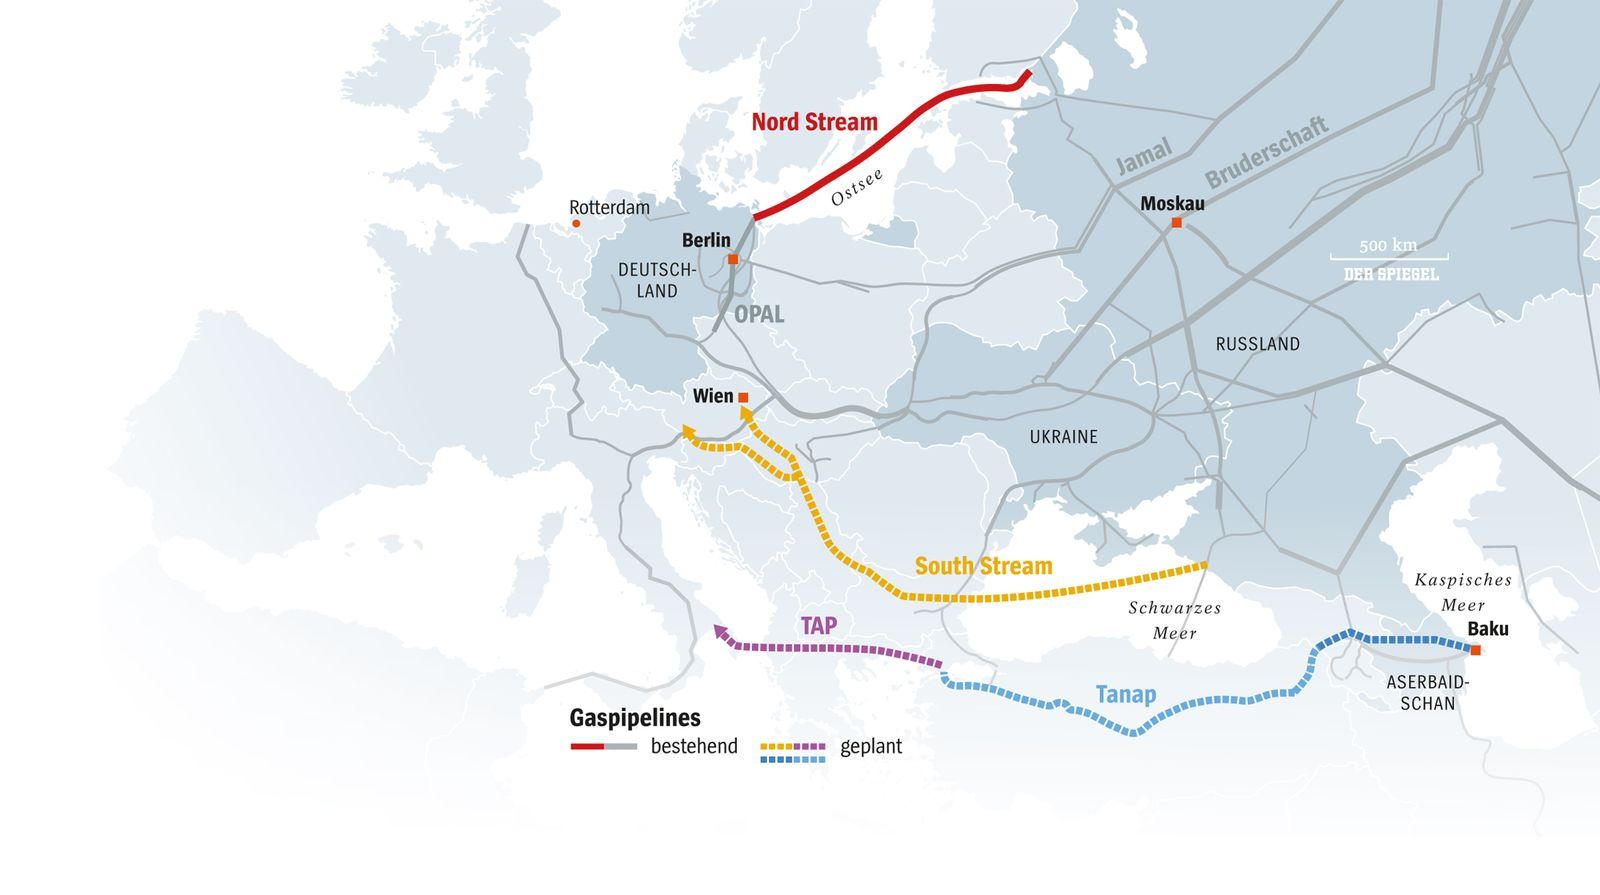 SP 19/2014 Grafik Gasversorgung / Gas / Pipelines / Ukraine / Russland